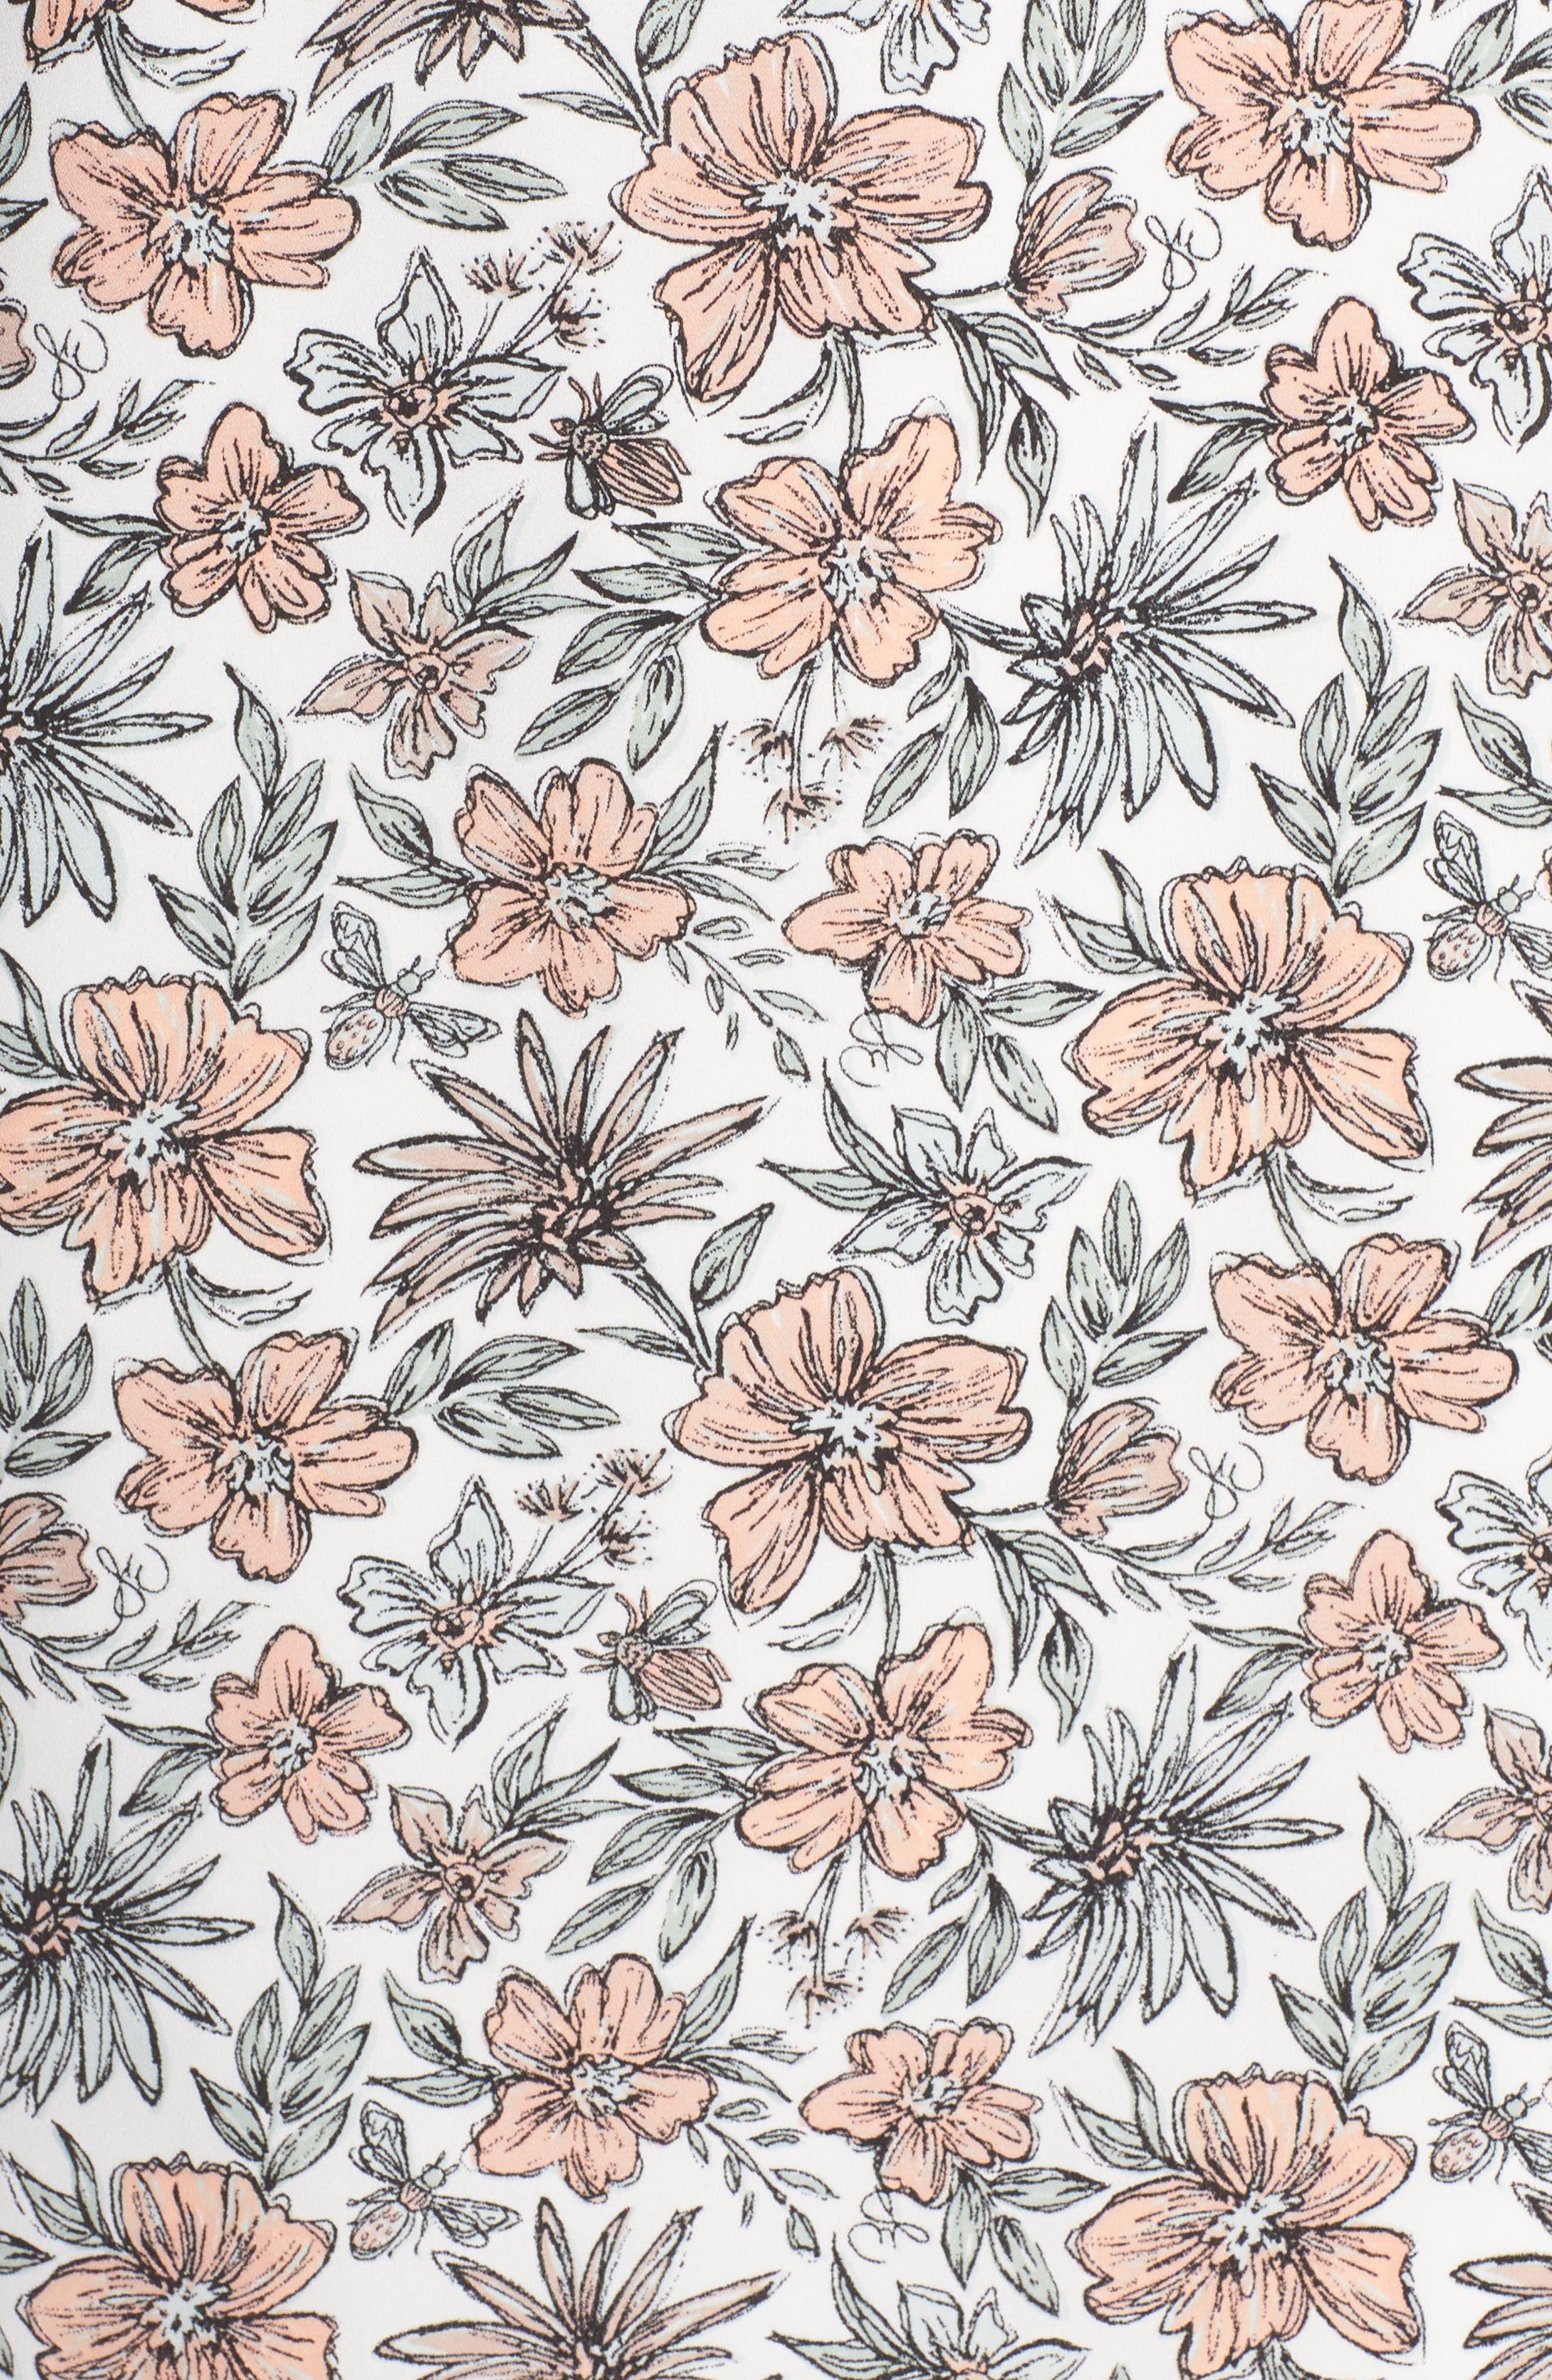 Off the Shoulder Shift Dress,                             Alternate thumbnail 6, color,                             Ivory/ Blush